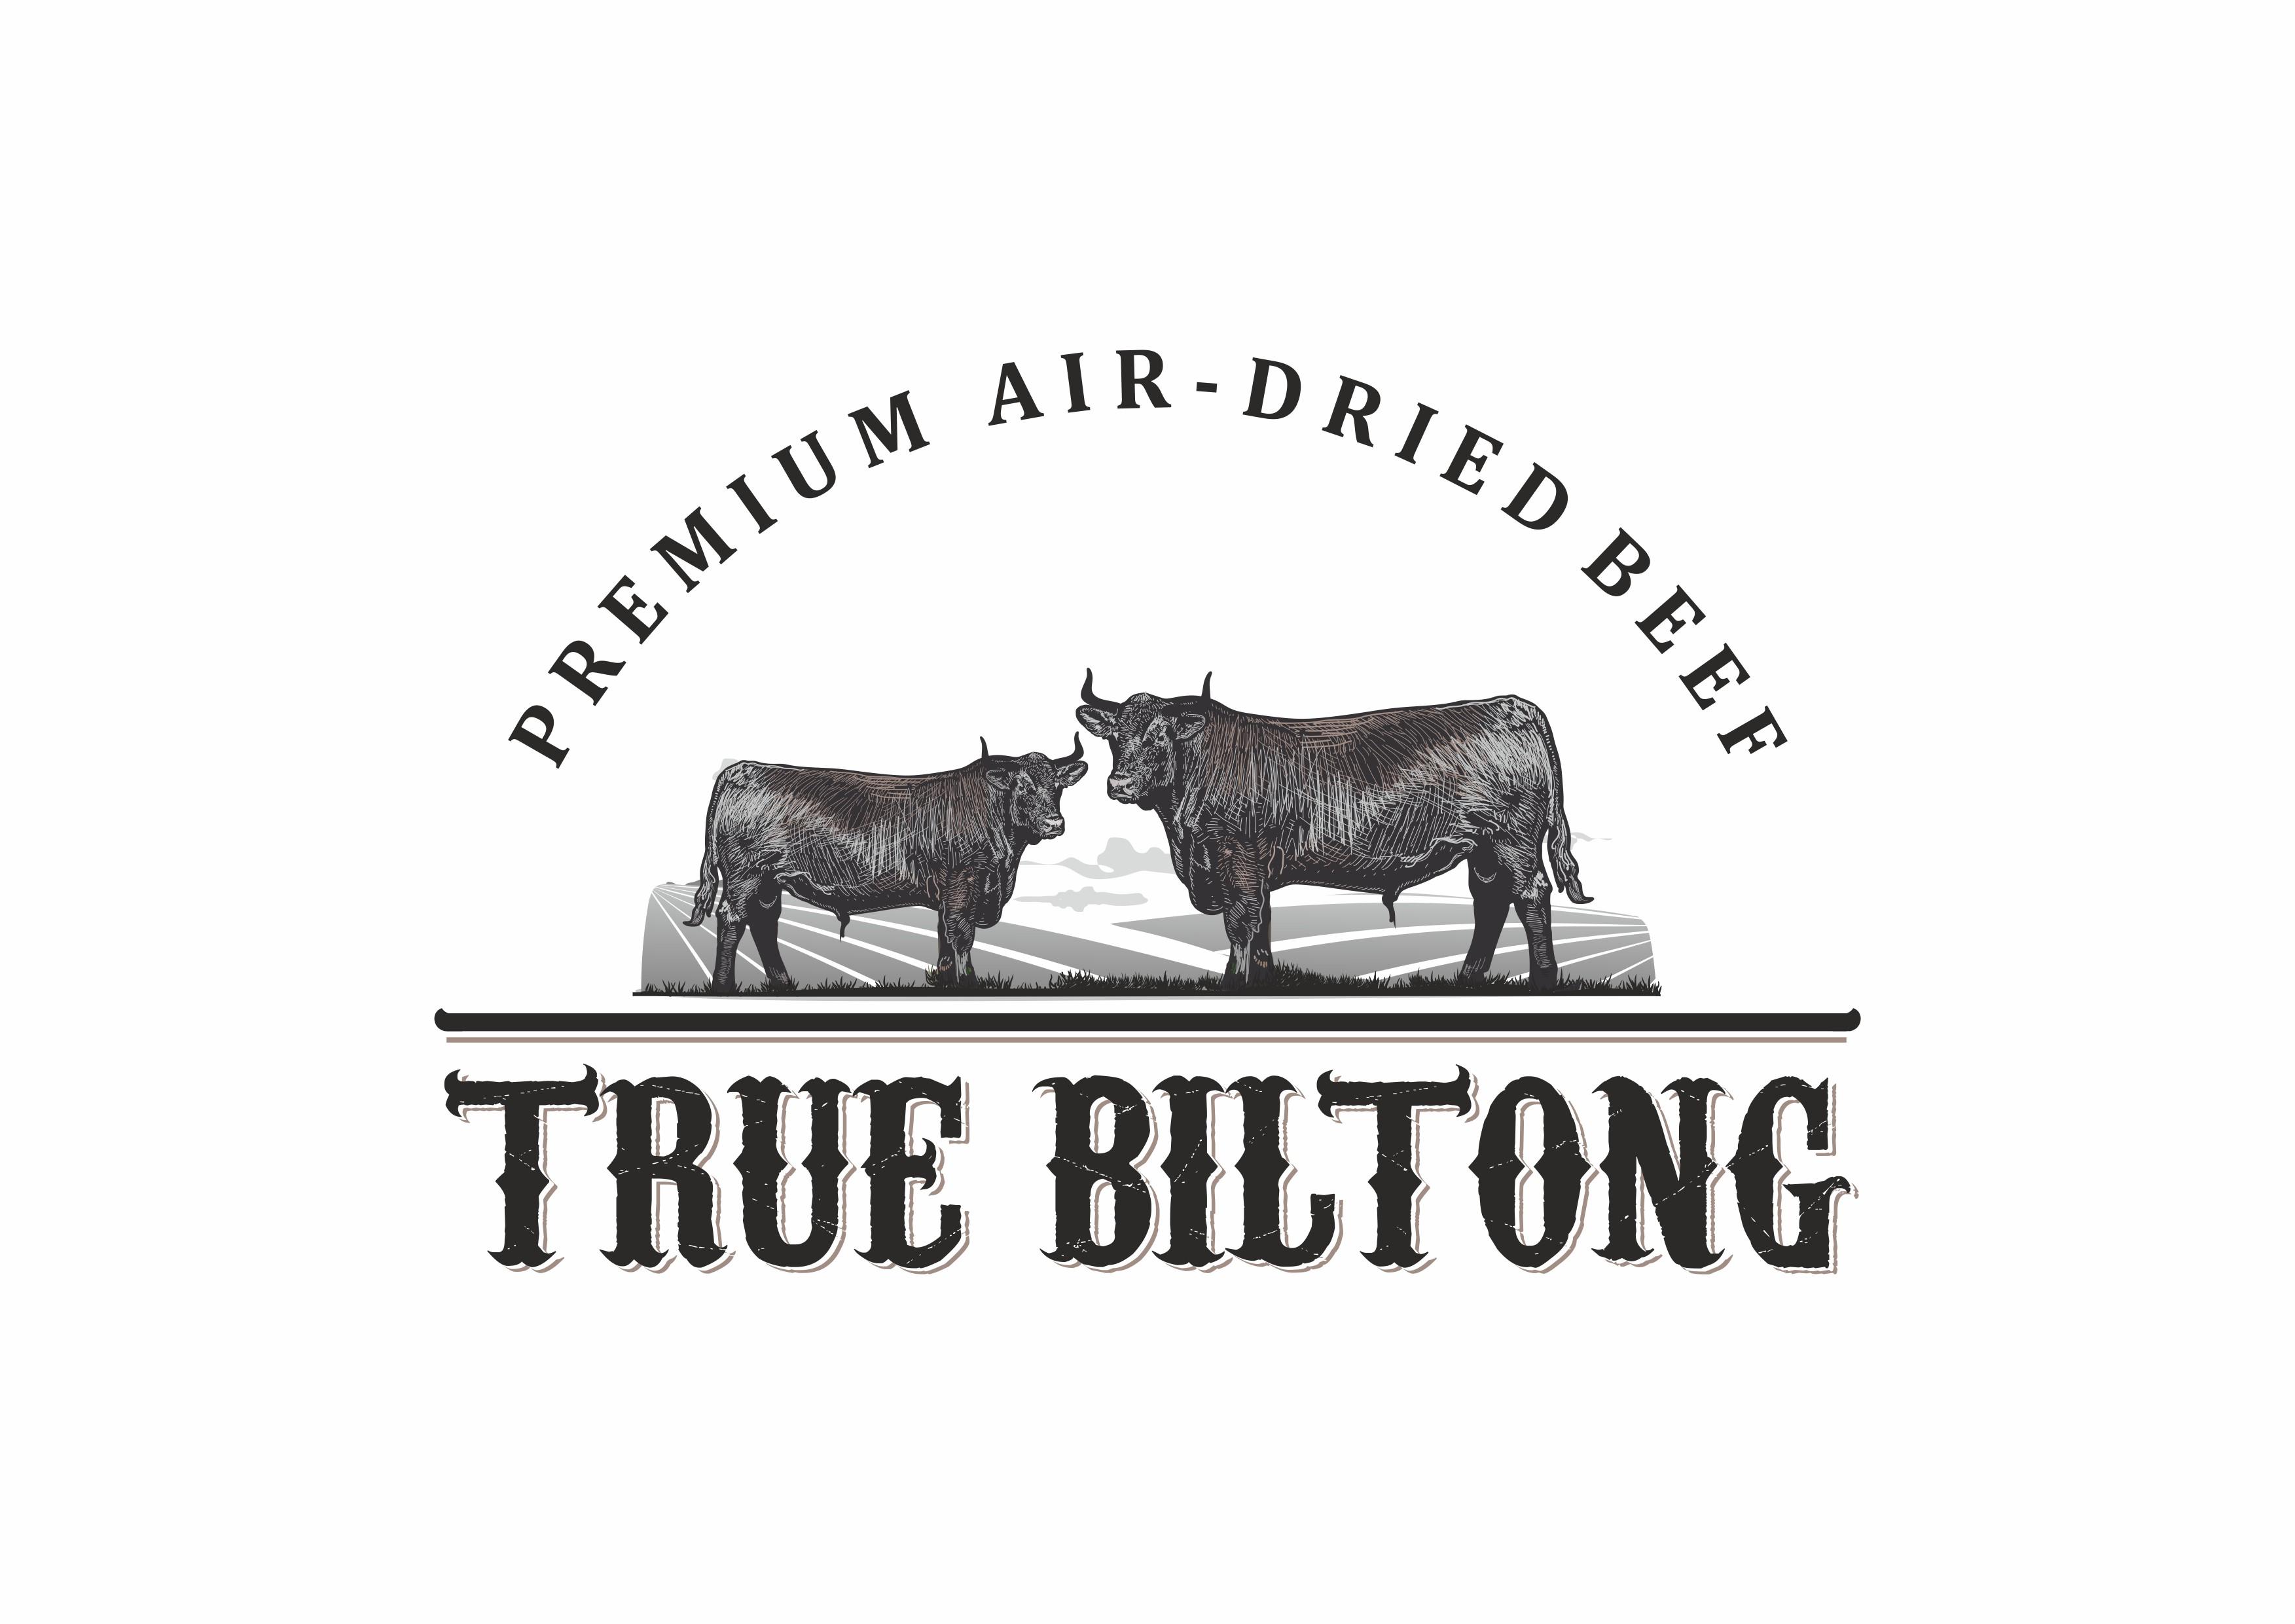 True Biltong - Premium Air-Dried Steak